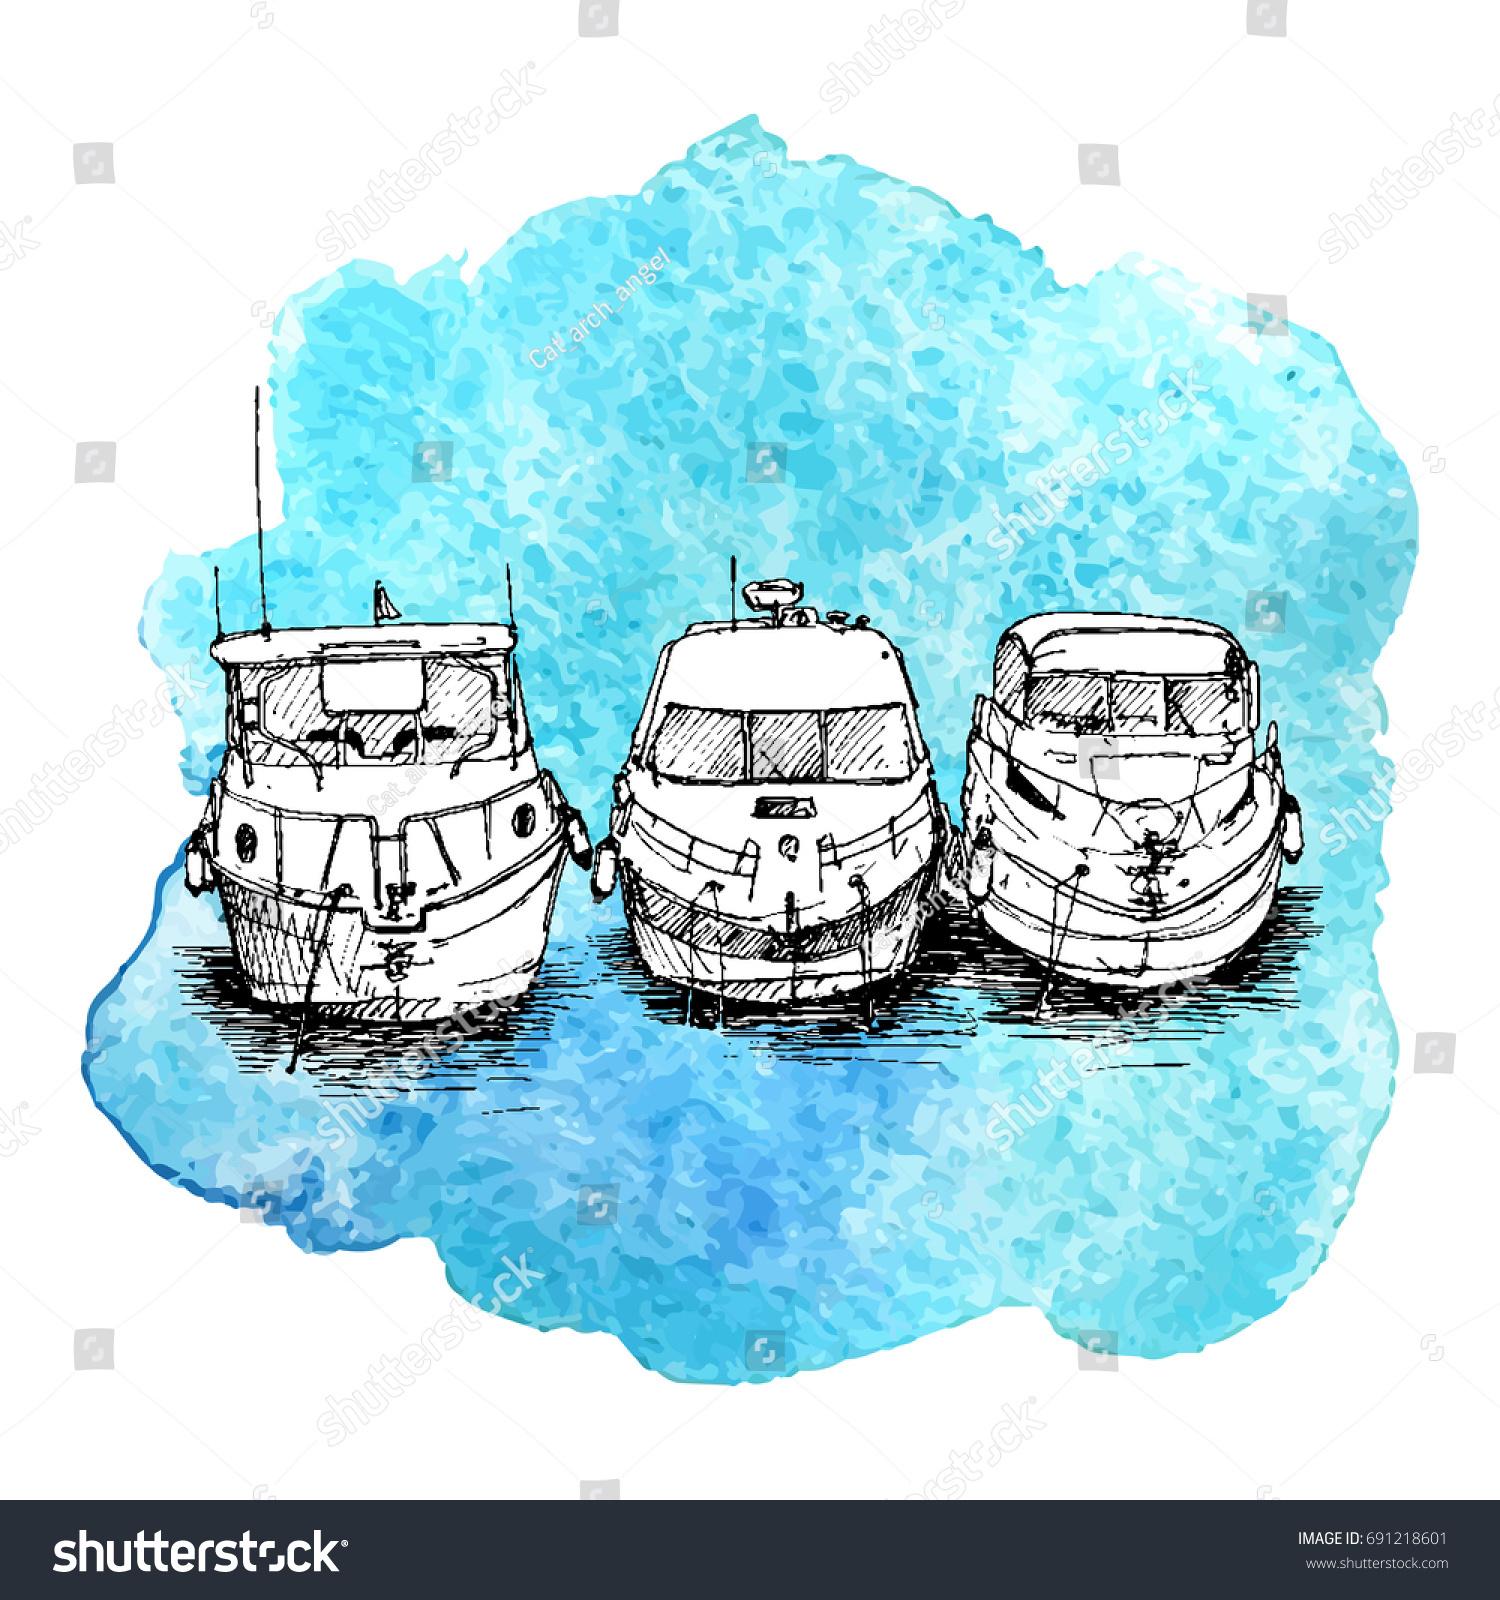 vector sketch boats blue watercolor background stock vector